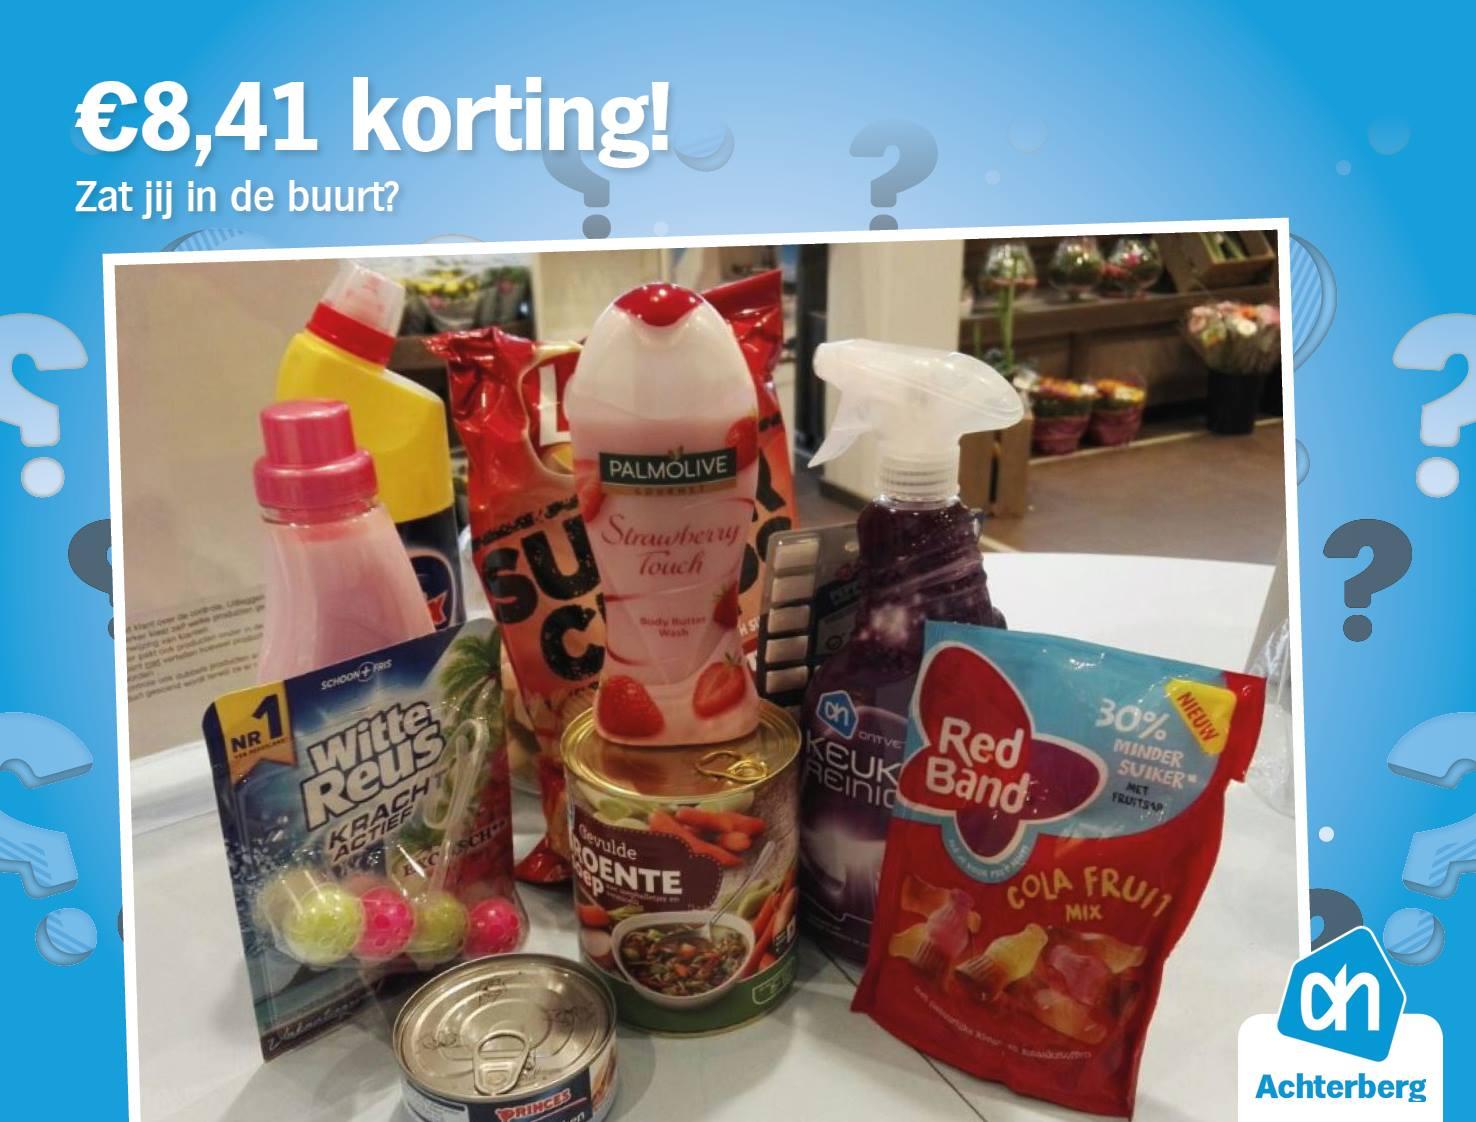 €8,41 Korting!